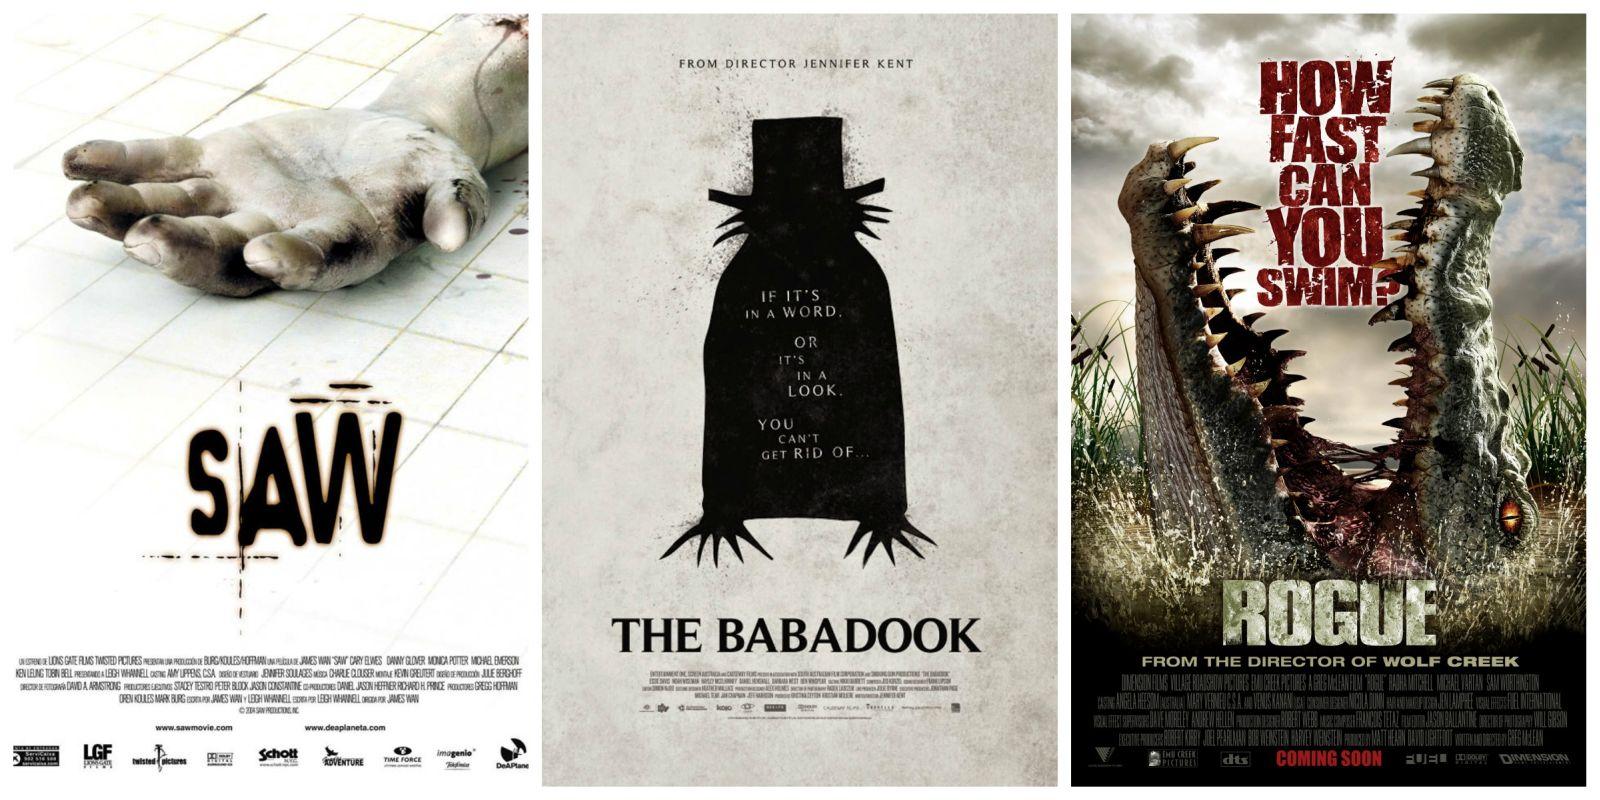 Australia, horror, Piła, filmy, australijskie, horrory